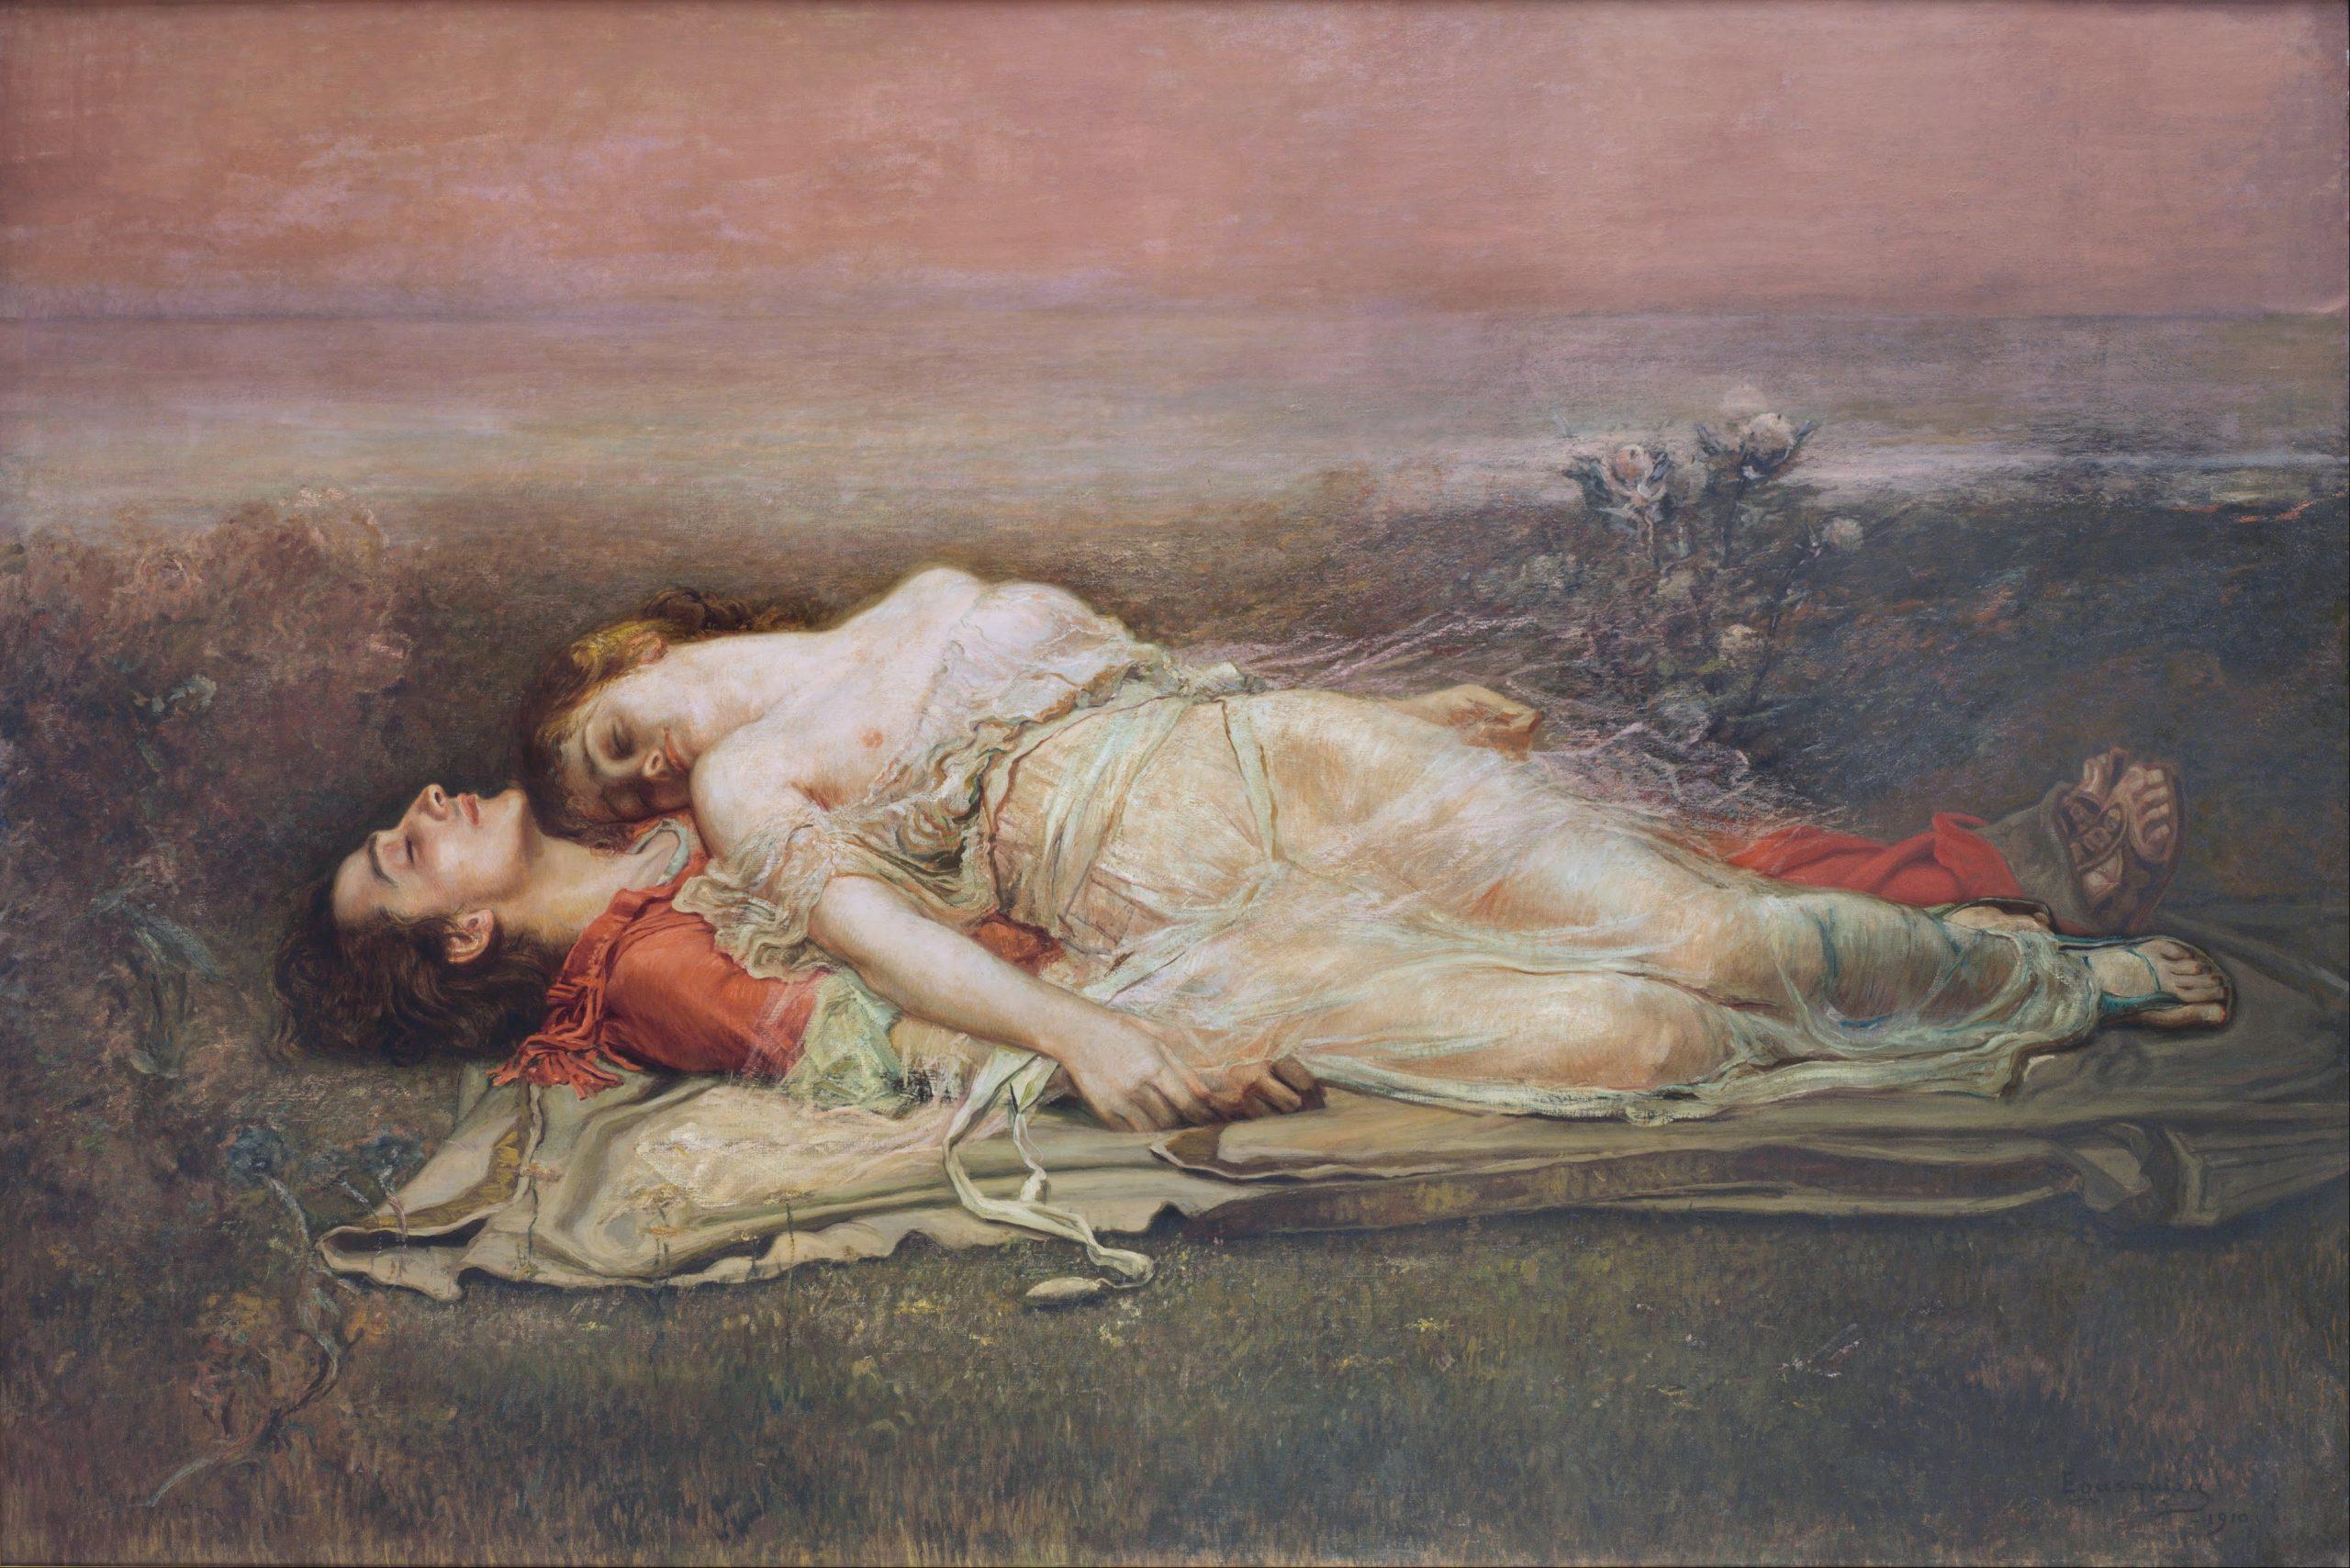 Tristan and Isolt, Rogelio de Egusquiza